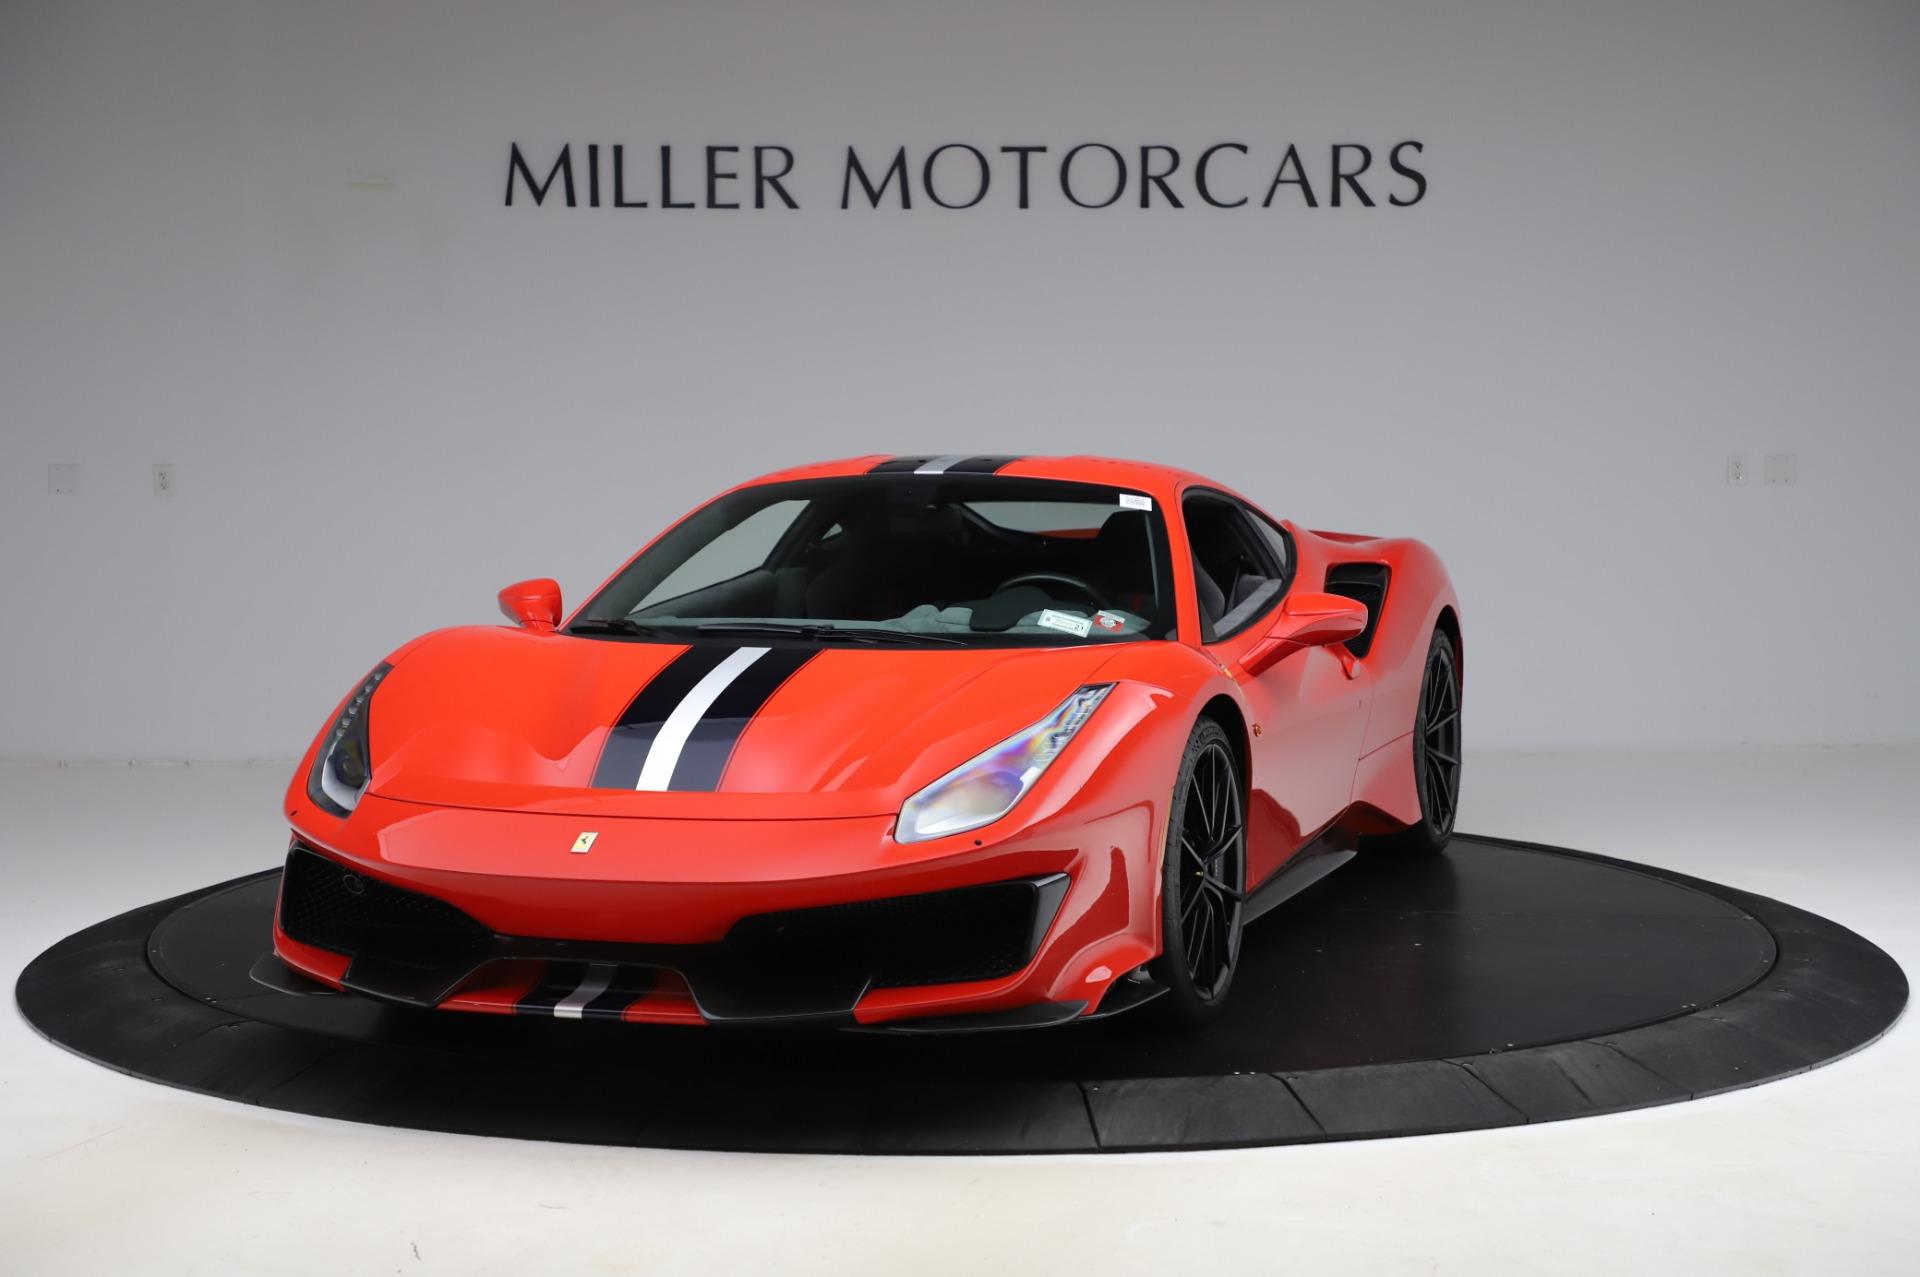 Used 2020 Ferrari 488 Pista for sale $439,900 at Rolls-Royce Motor Cars Greenwich in Greenwich CT 06830 1